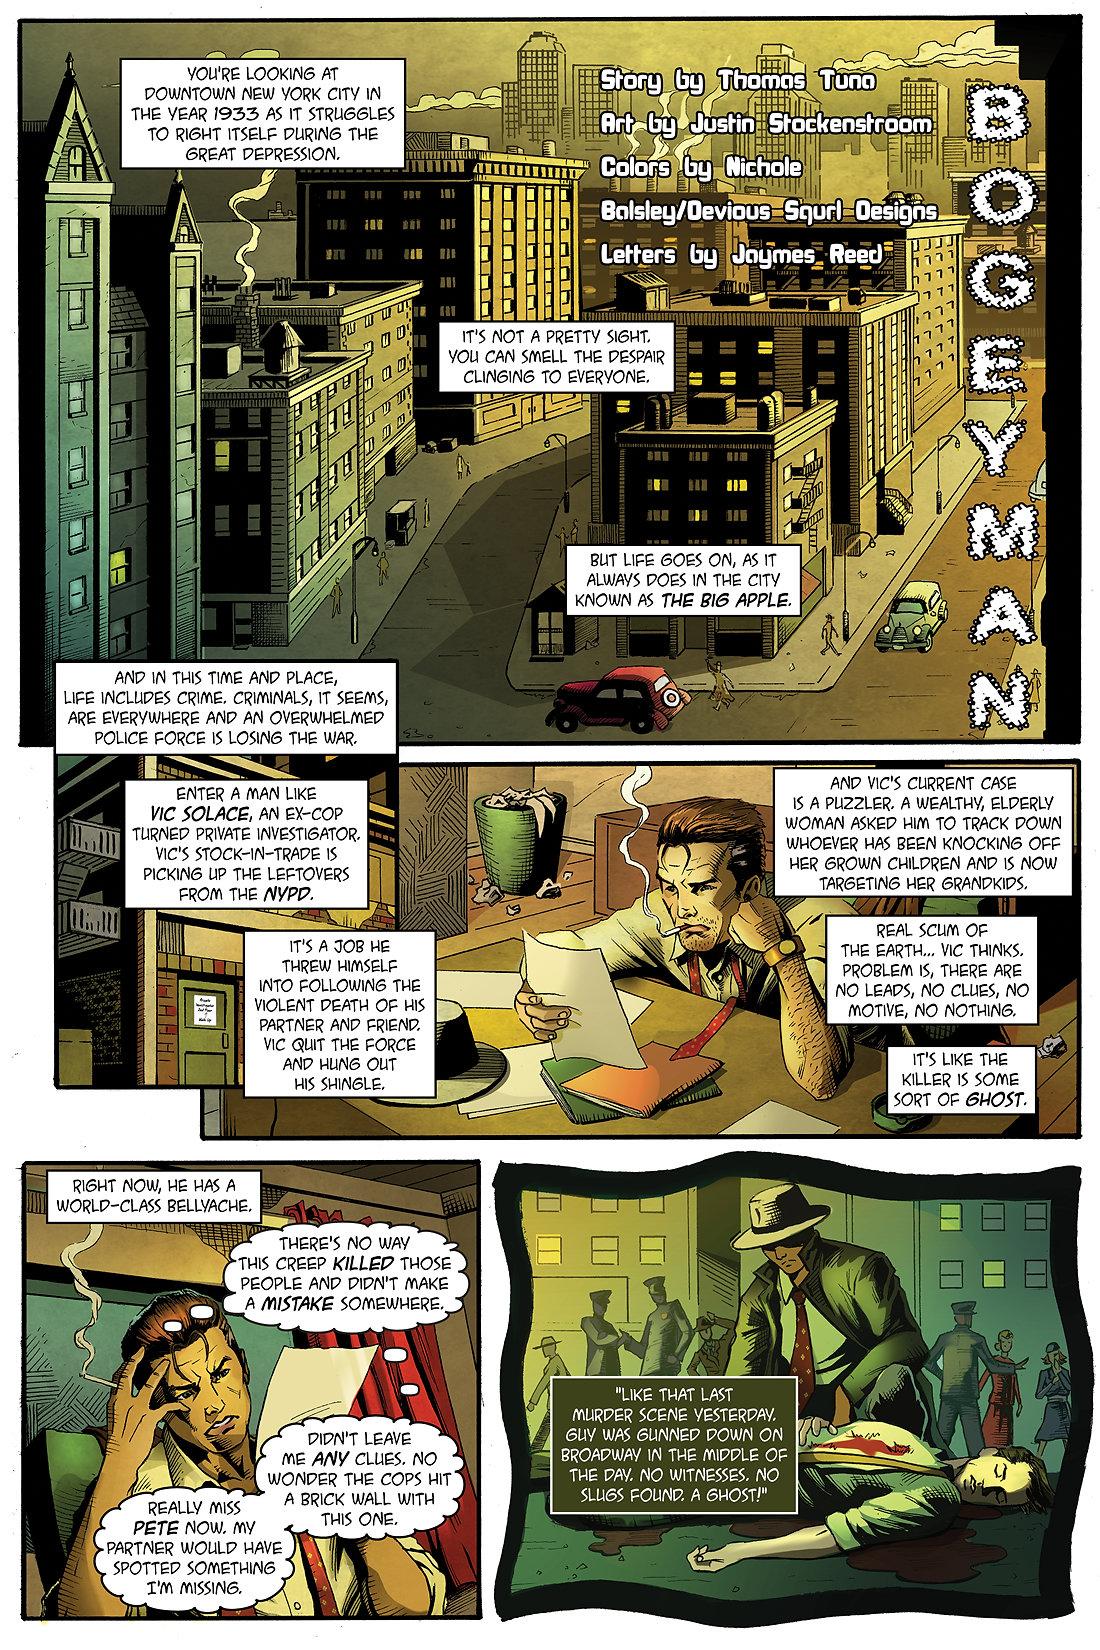 Bogeyman_Page01.jpg